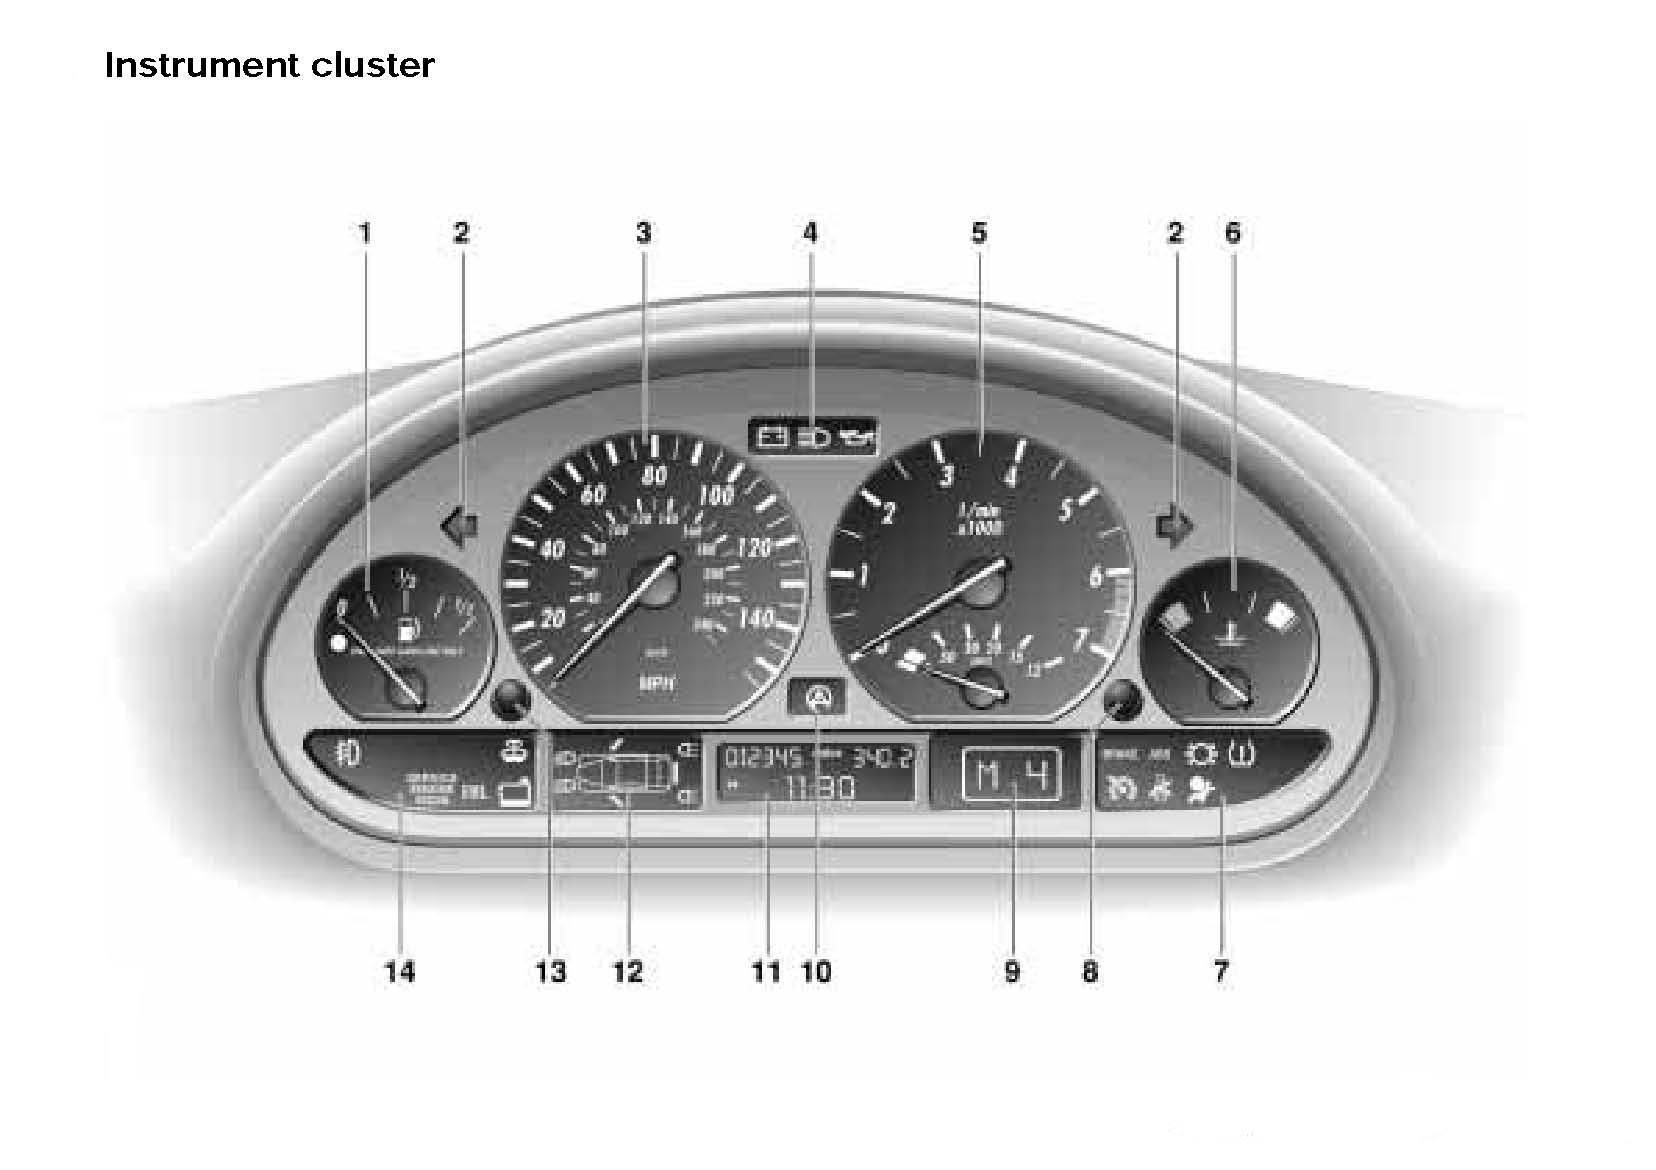 Bmw dashboard symbols 325i carburetor gallery bmw dashboard symbols 325i hd gallery buycottarizona Image collections